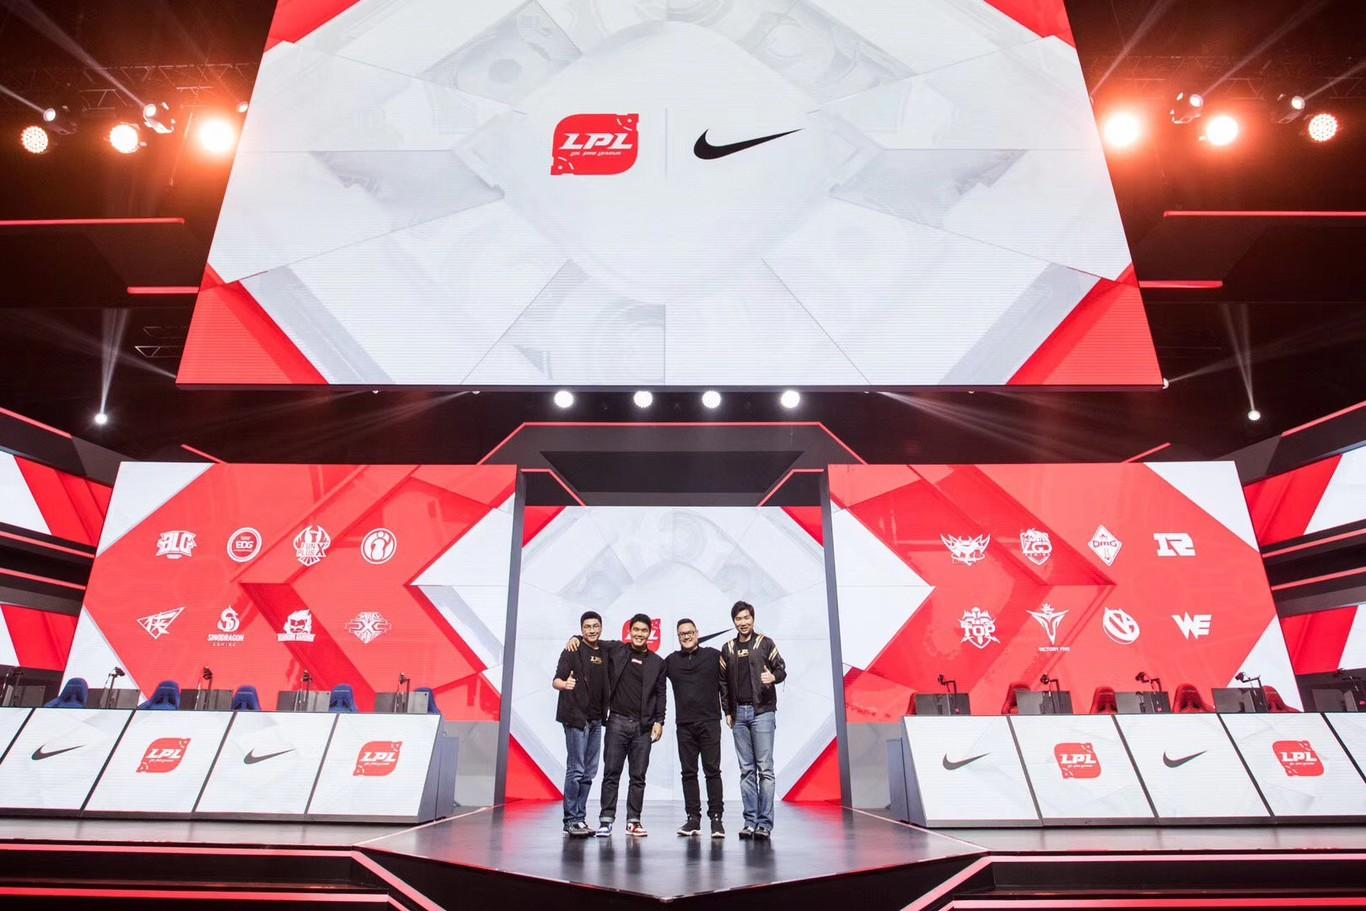 Nike presentó las camisetas de LPL para Worlds 2019